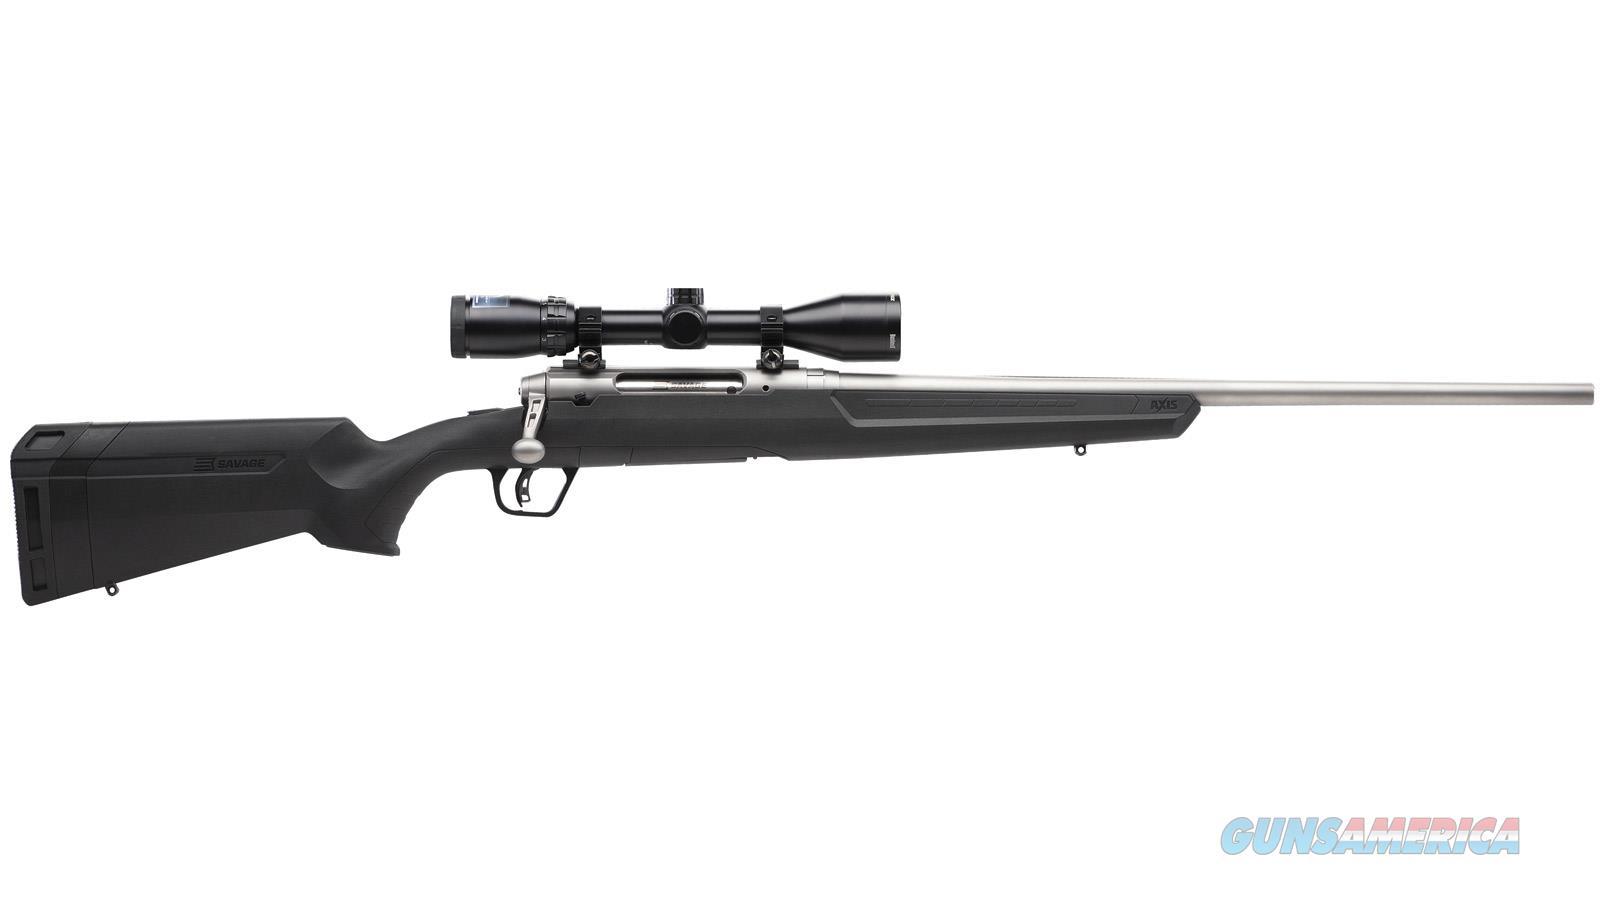 Savage Arms Axis Ii Xp Ss 223Rem 22 57101  Guns > Rifles > S Misc Rifles